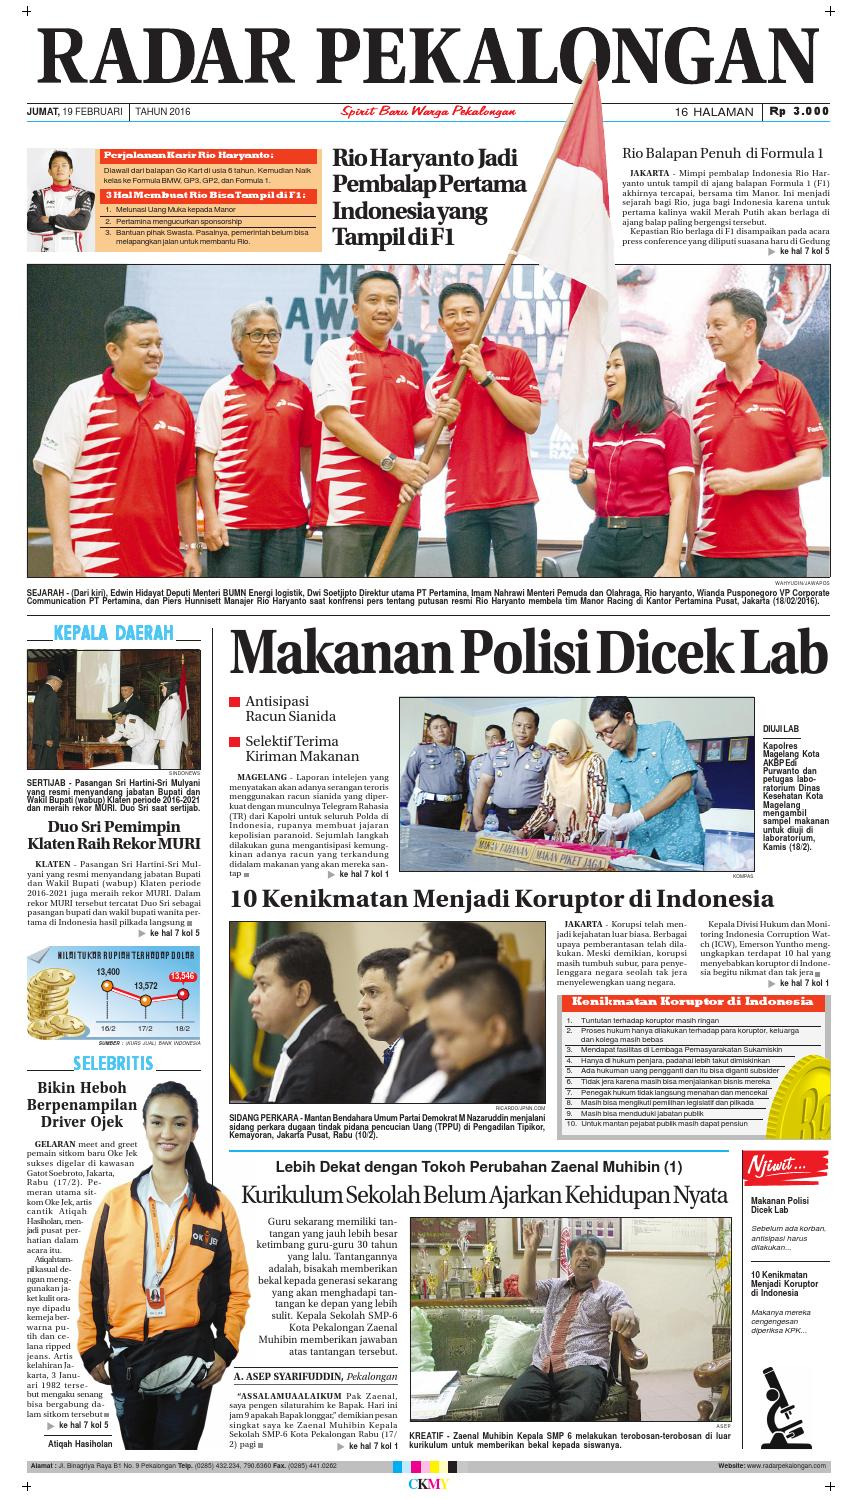 Radar Pekalongan 19 Februari 2016 By Issuu Produk Ukm Bumn Pusaka Coffee 15 Pcs Kopi Herbal Nusantara Free Ongkir Depok Ampamp Jakarta